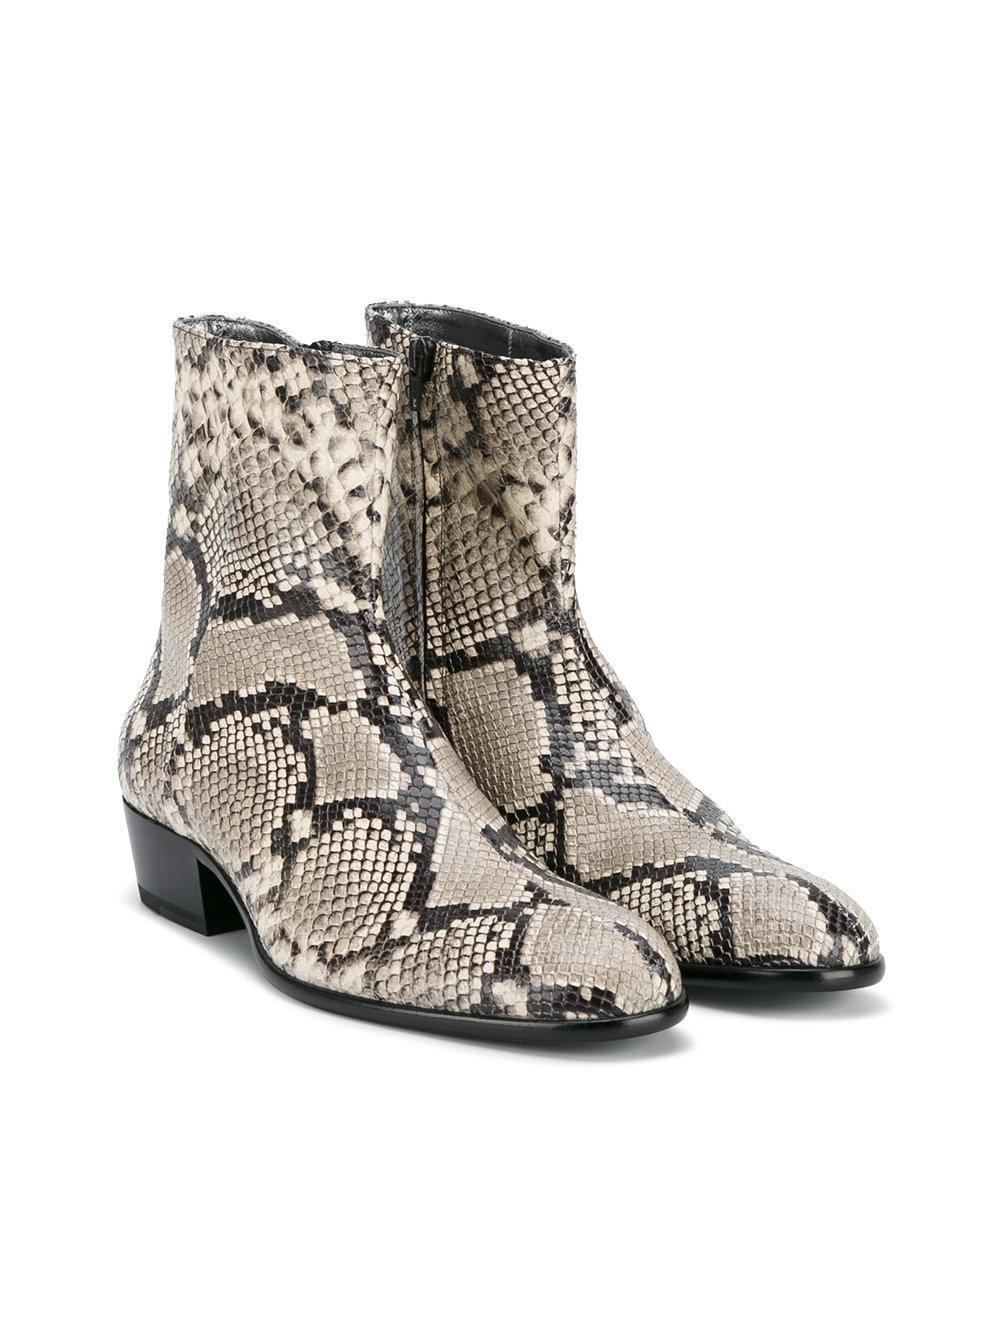 Snakeskin Mens Fashion